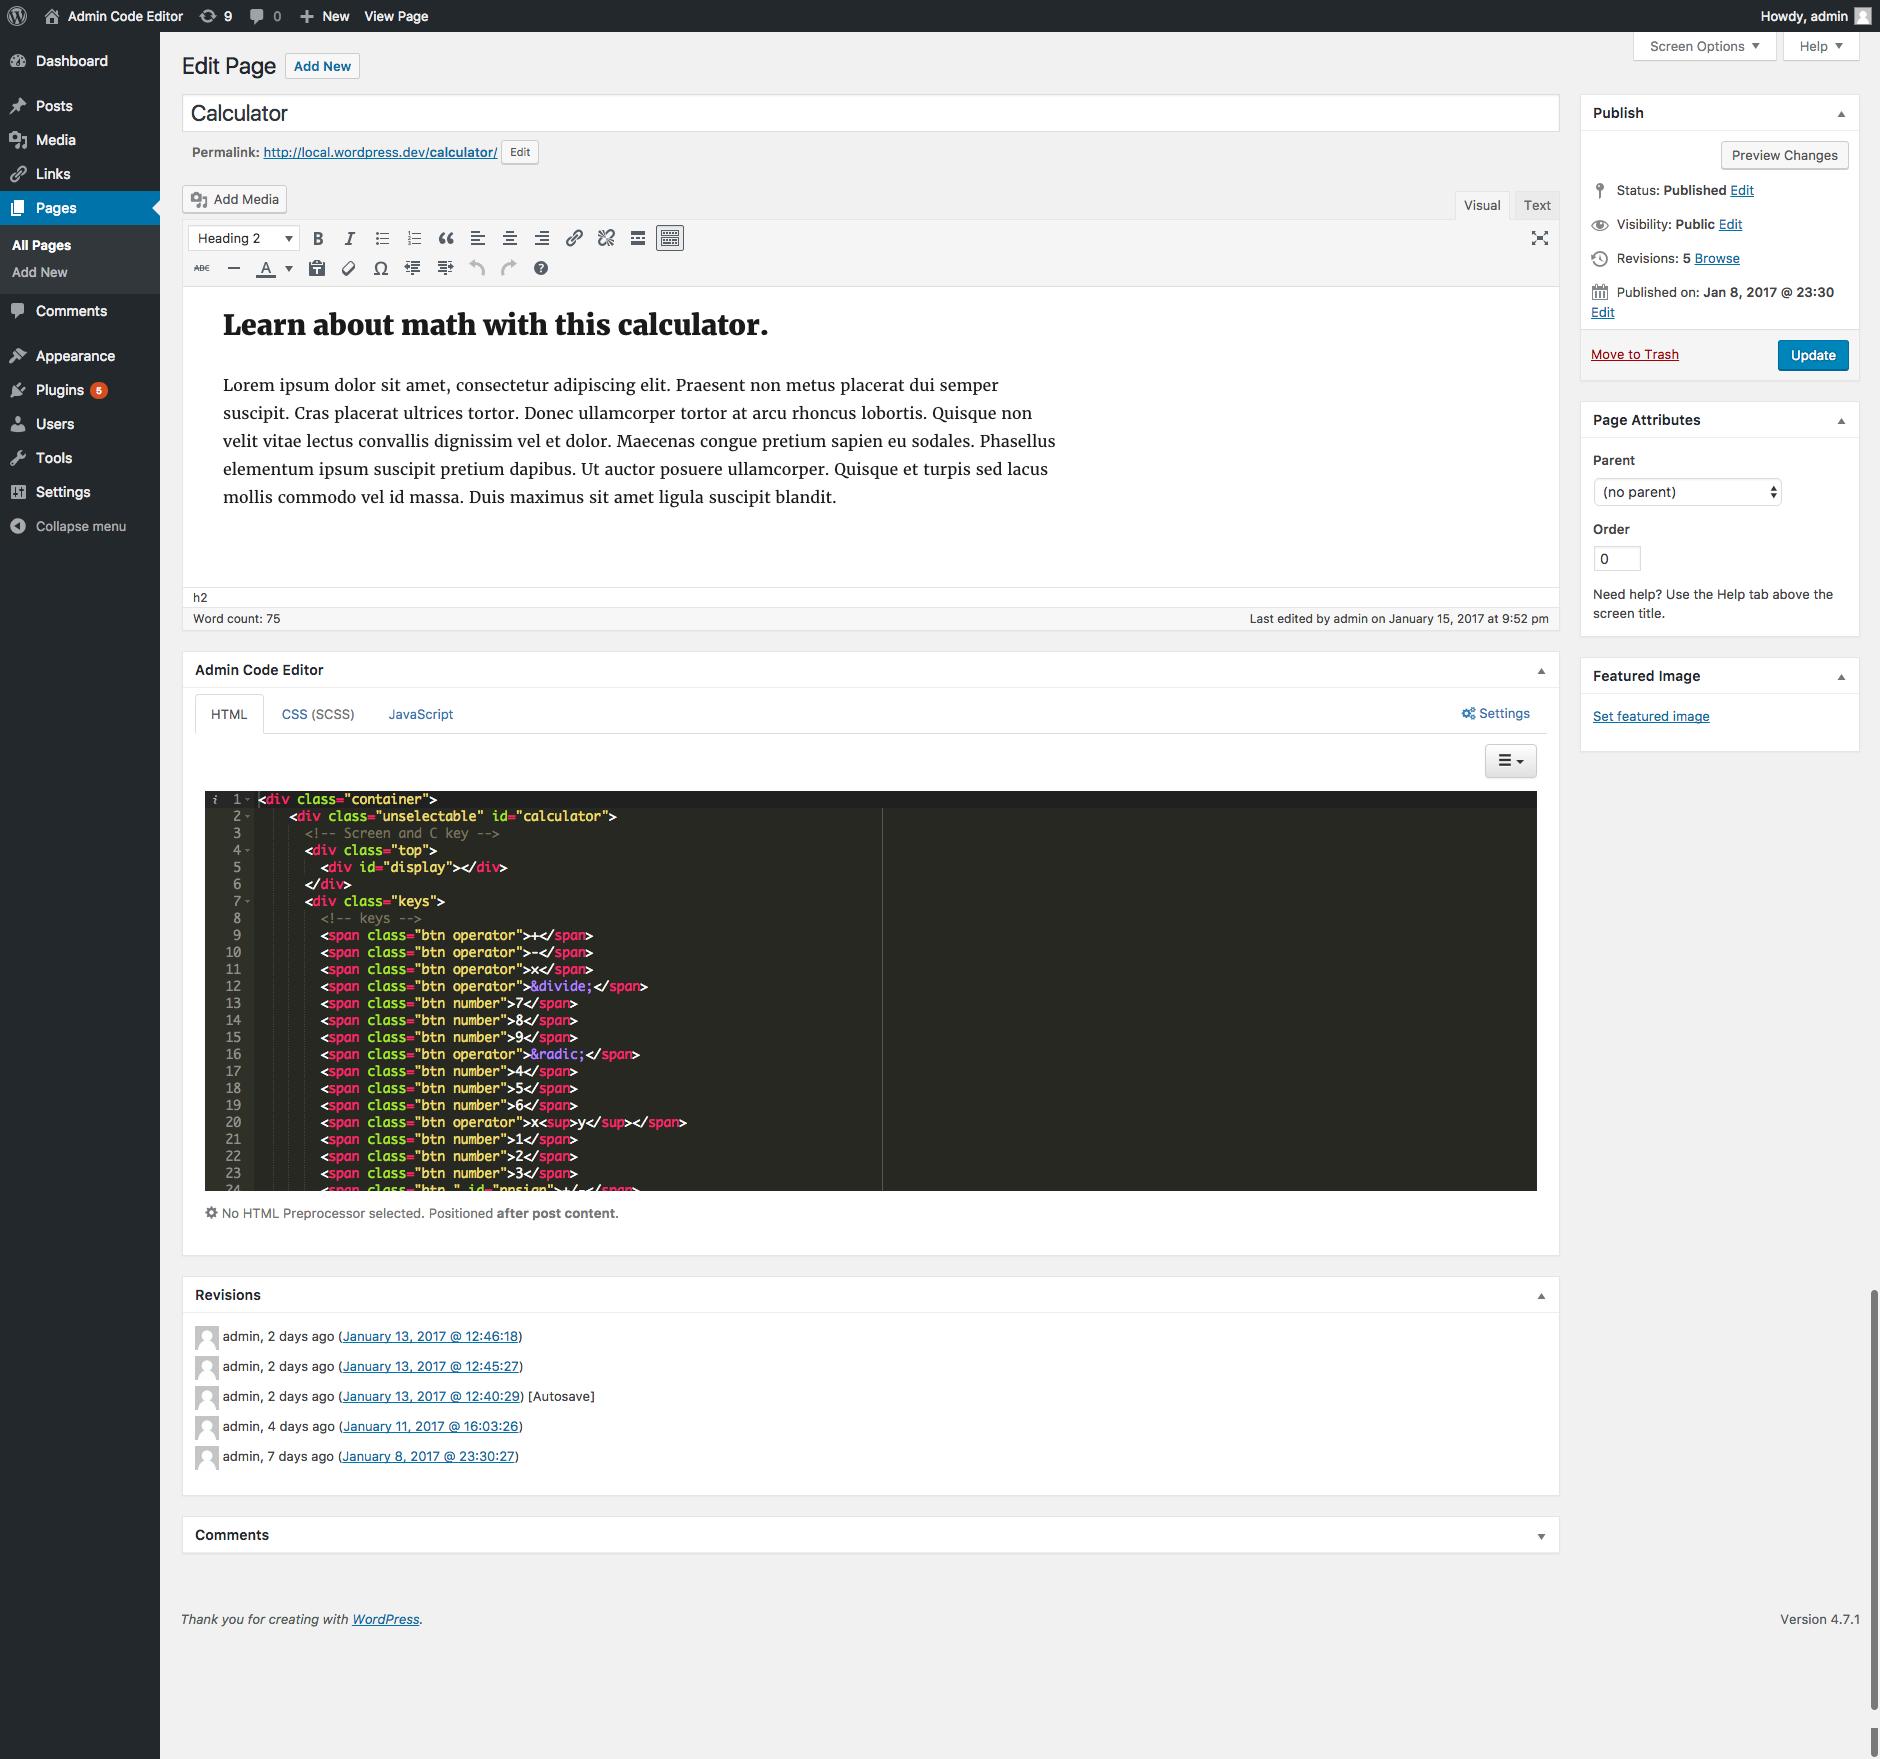 The Admin Code Editor HTML Editor.